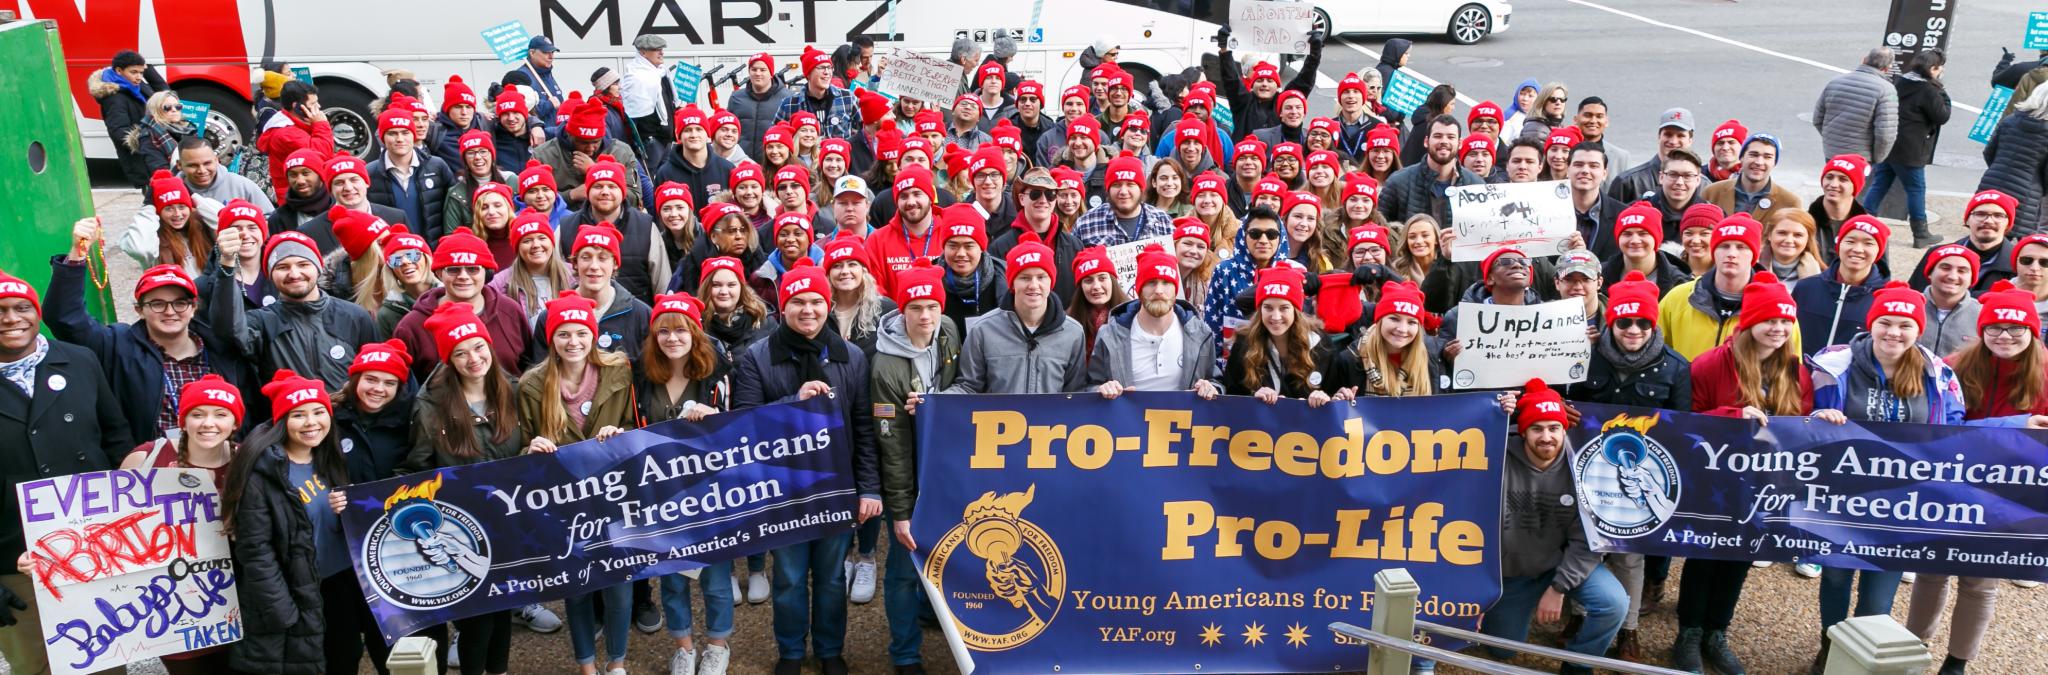 pro-life-freedom-2048x675